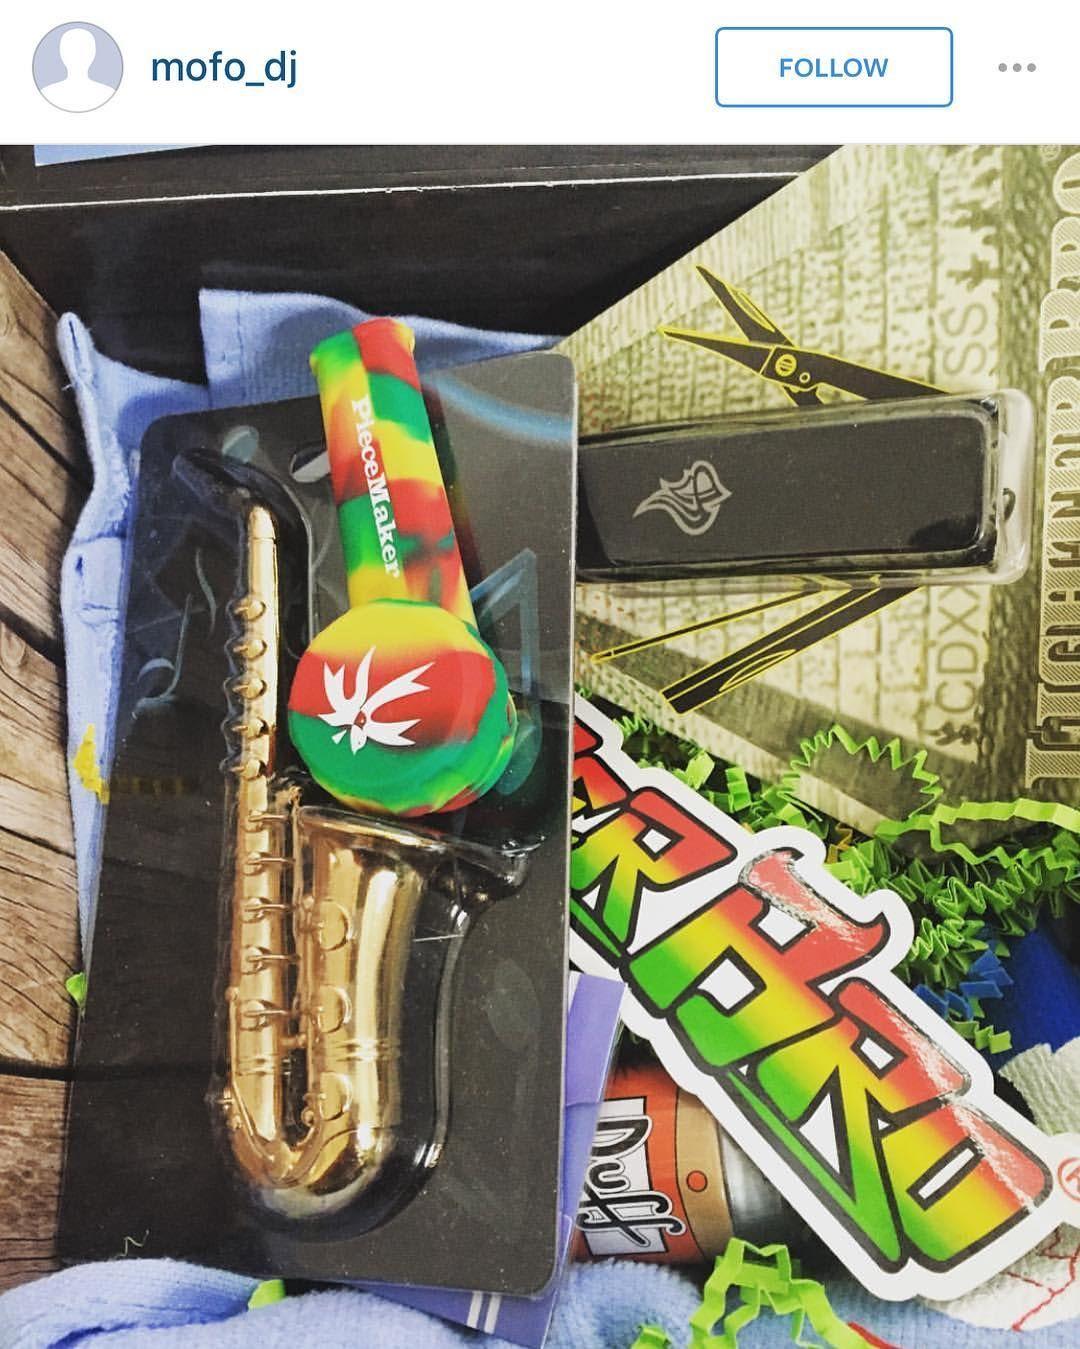 @mofo_dj and our #rasta #karma Blaze YOUR own trail. #piecemakergear.com#piecemaker #BlazeYourOwnTrail #byot #backpacker #cannabiscup #outdoorretailer #discgolf #rei #golf #budtender #surfing #outdoorgear #hammocklife #fishingtrip #comiccon #skibum #gamer #tattooartist #amazingink #dirtbag #campingtrip #stonersloth #travelgear #adventureanywhere #everydaycarry #skater #マリファナ